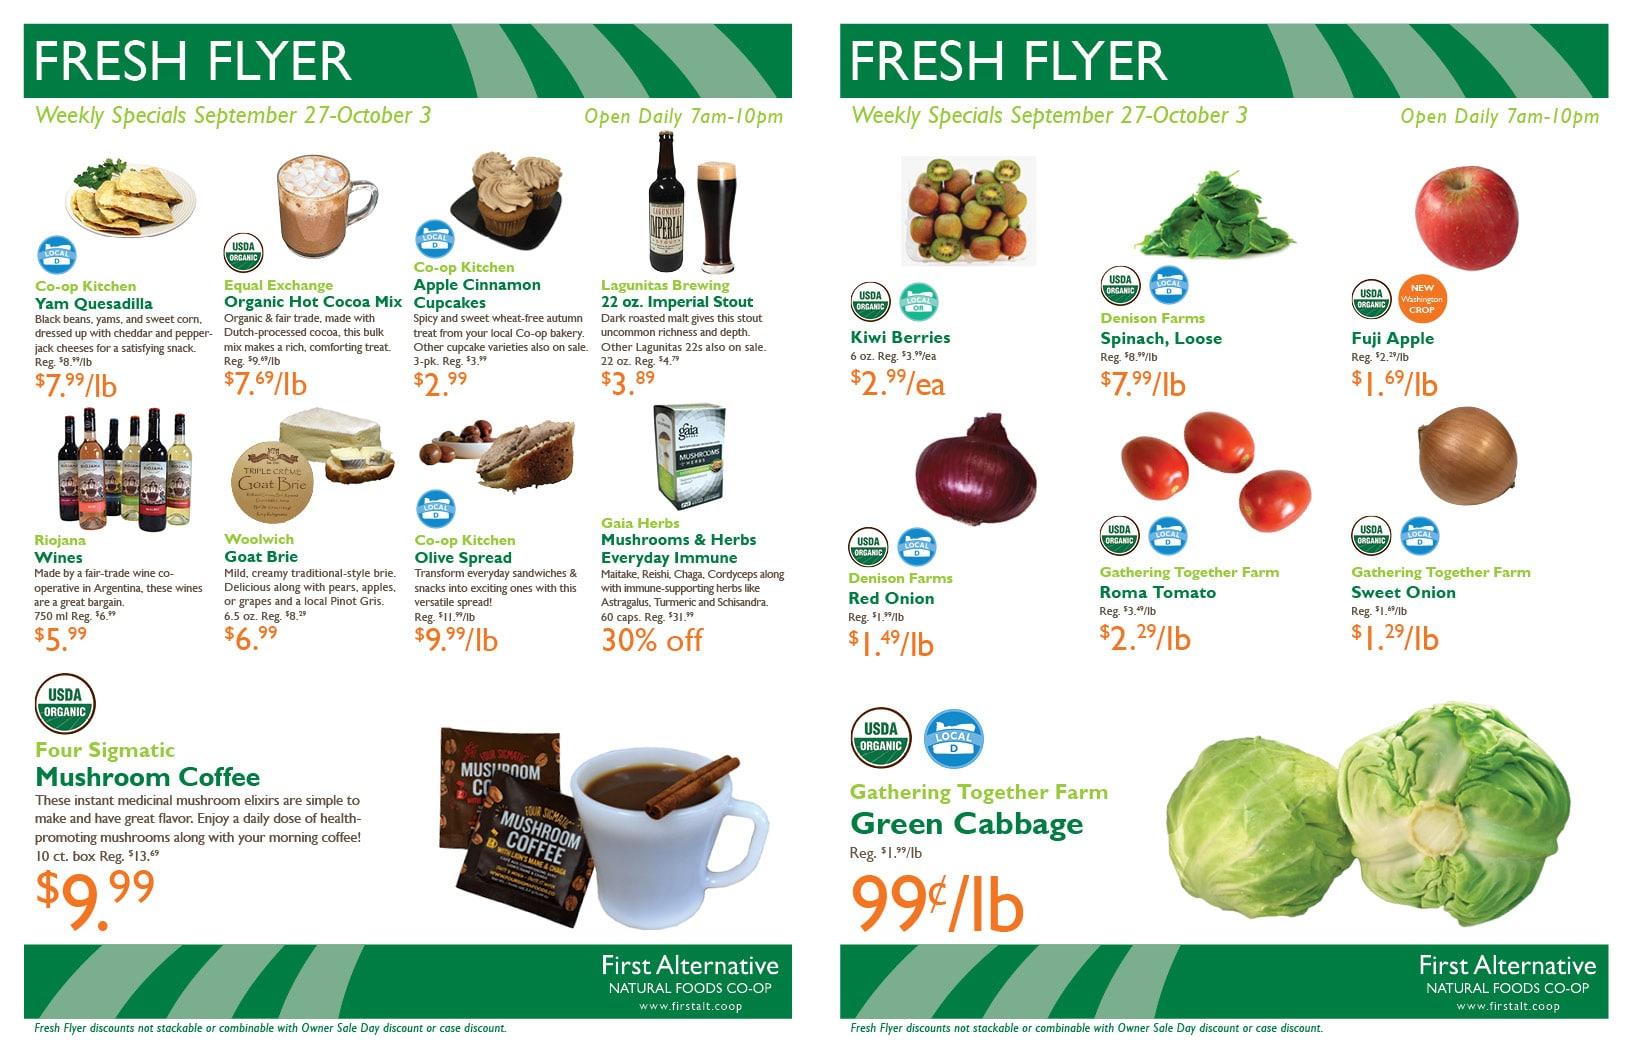 First Alternative Co-op Fresh Flyer September 27-October 3